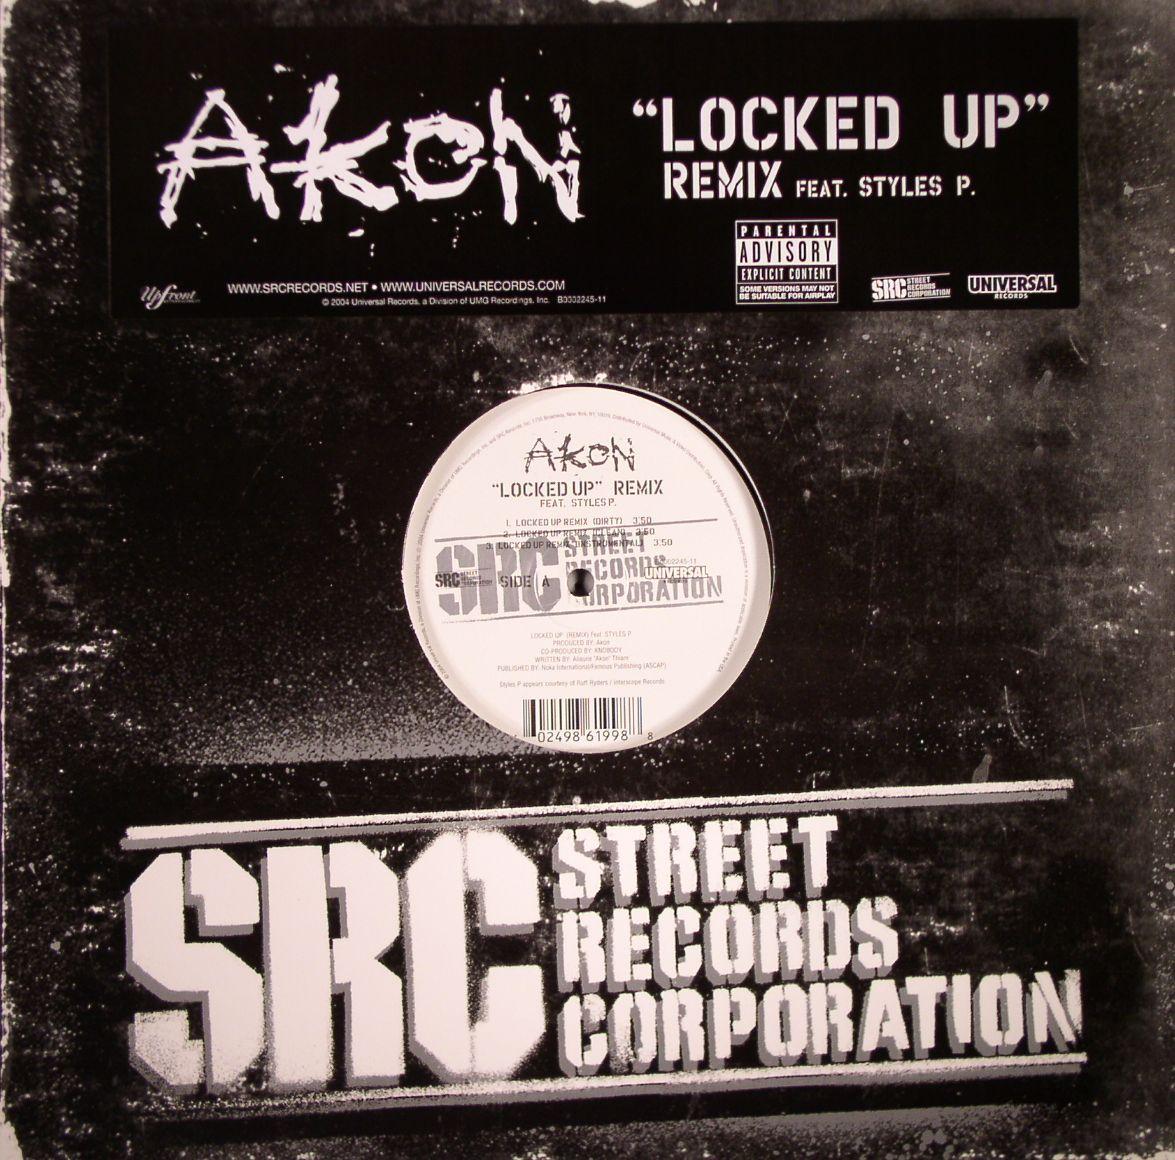 Lyrics to locked up remix